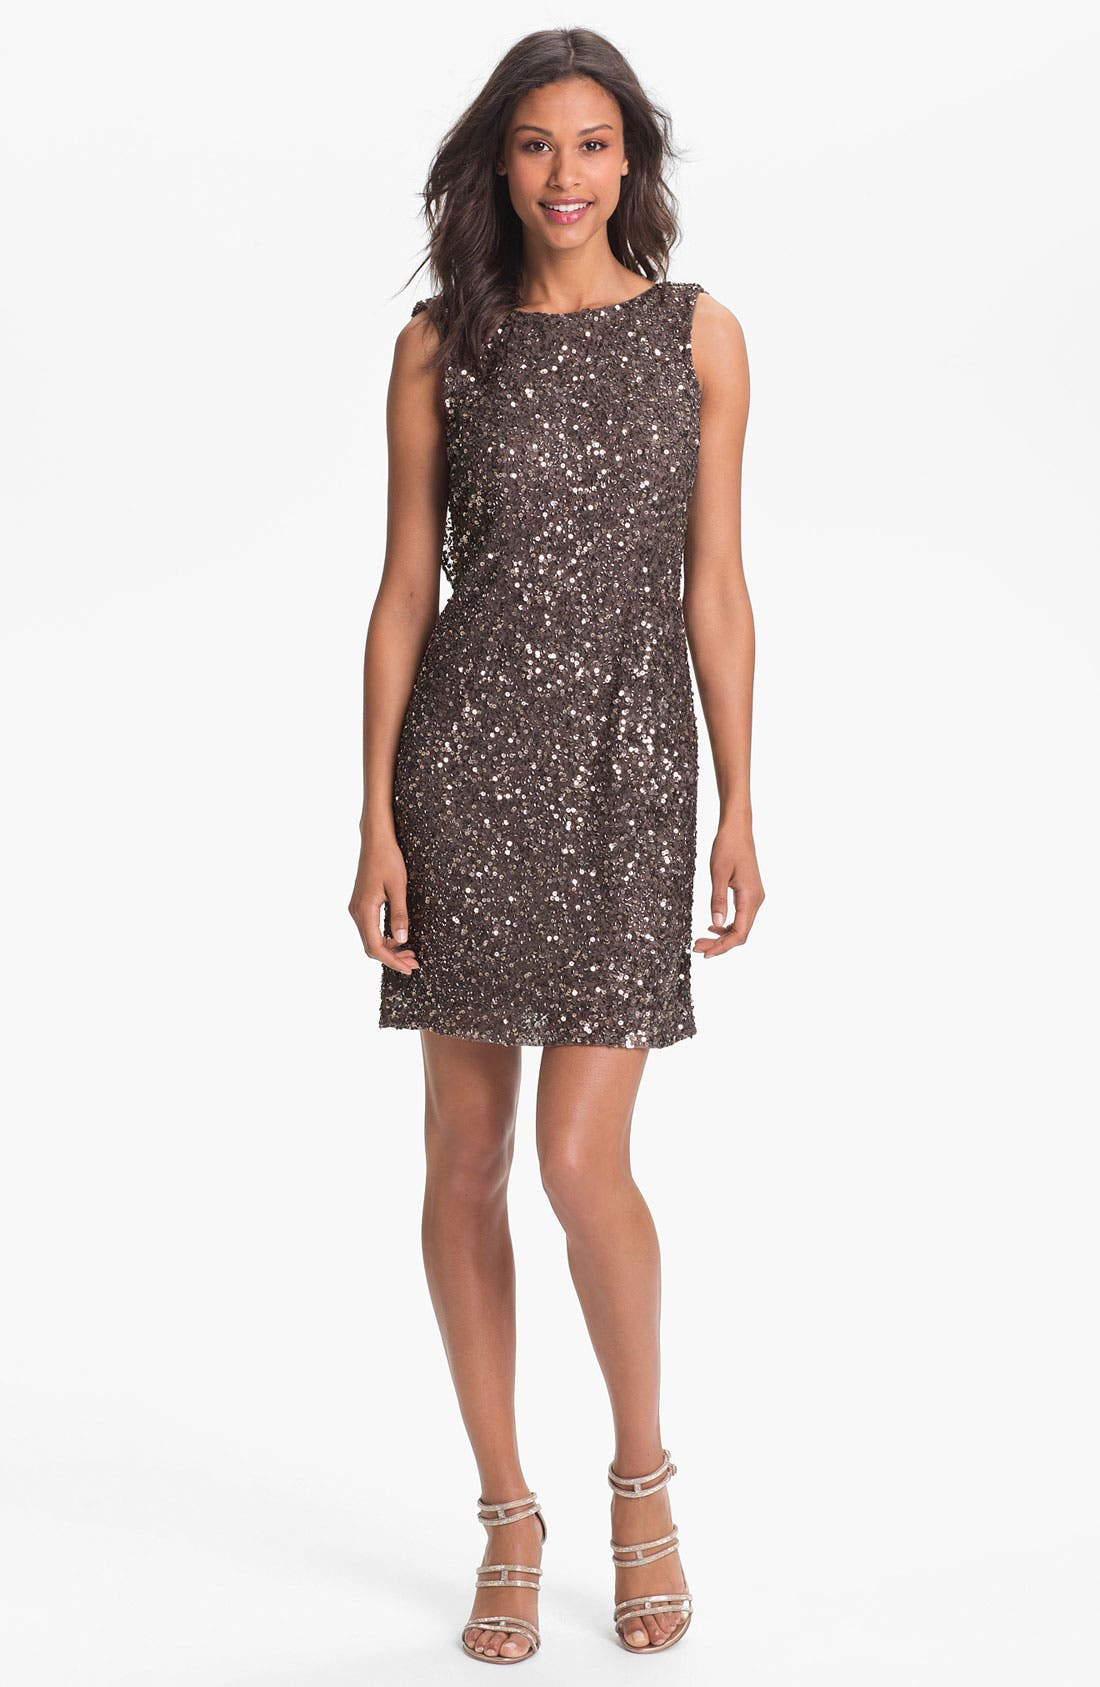 Alternate Image 1 Selected - Pisarro Nights Drape Back Sequin Dress